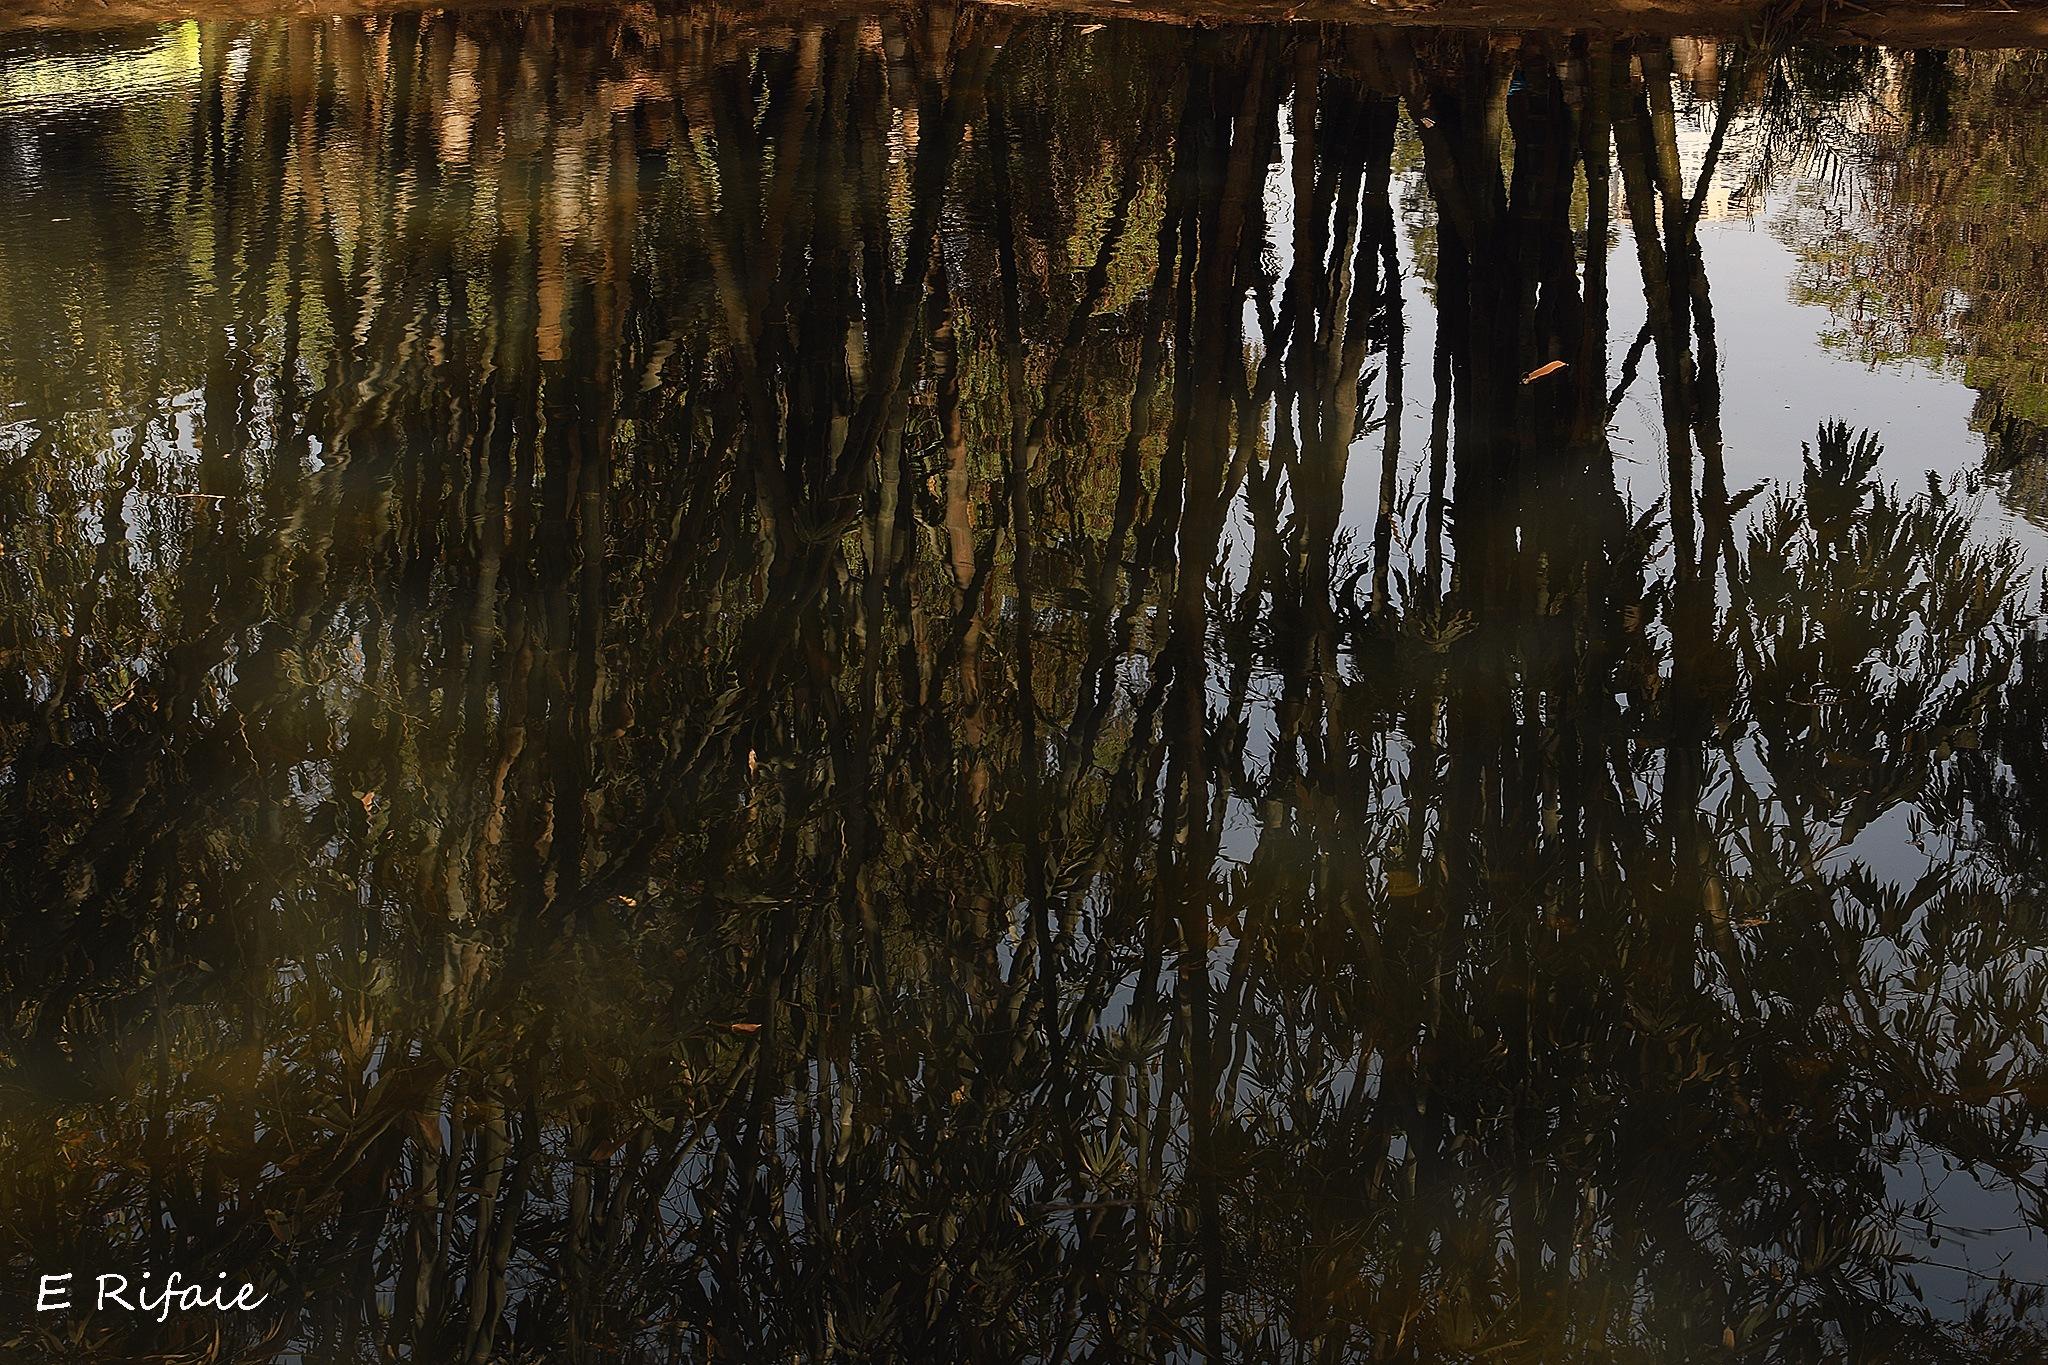 Bambo reflection by Emad Eldin Moustafa El Refaie